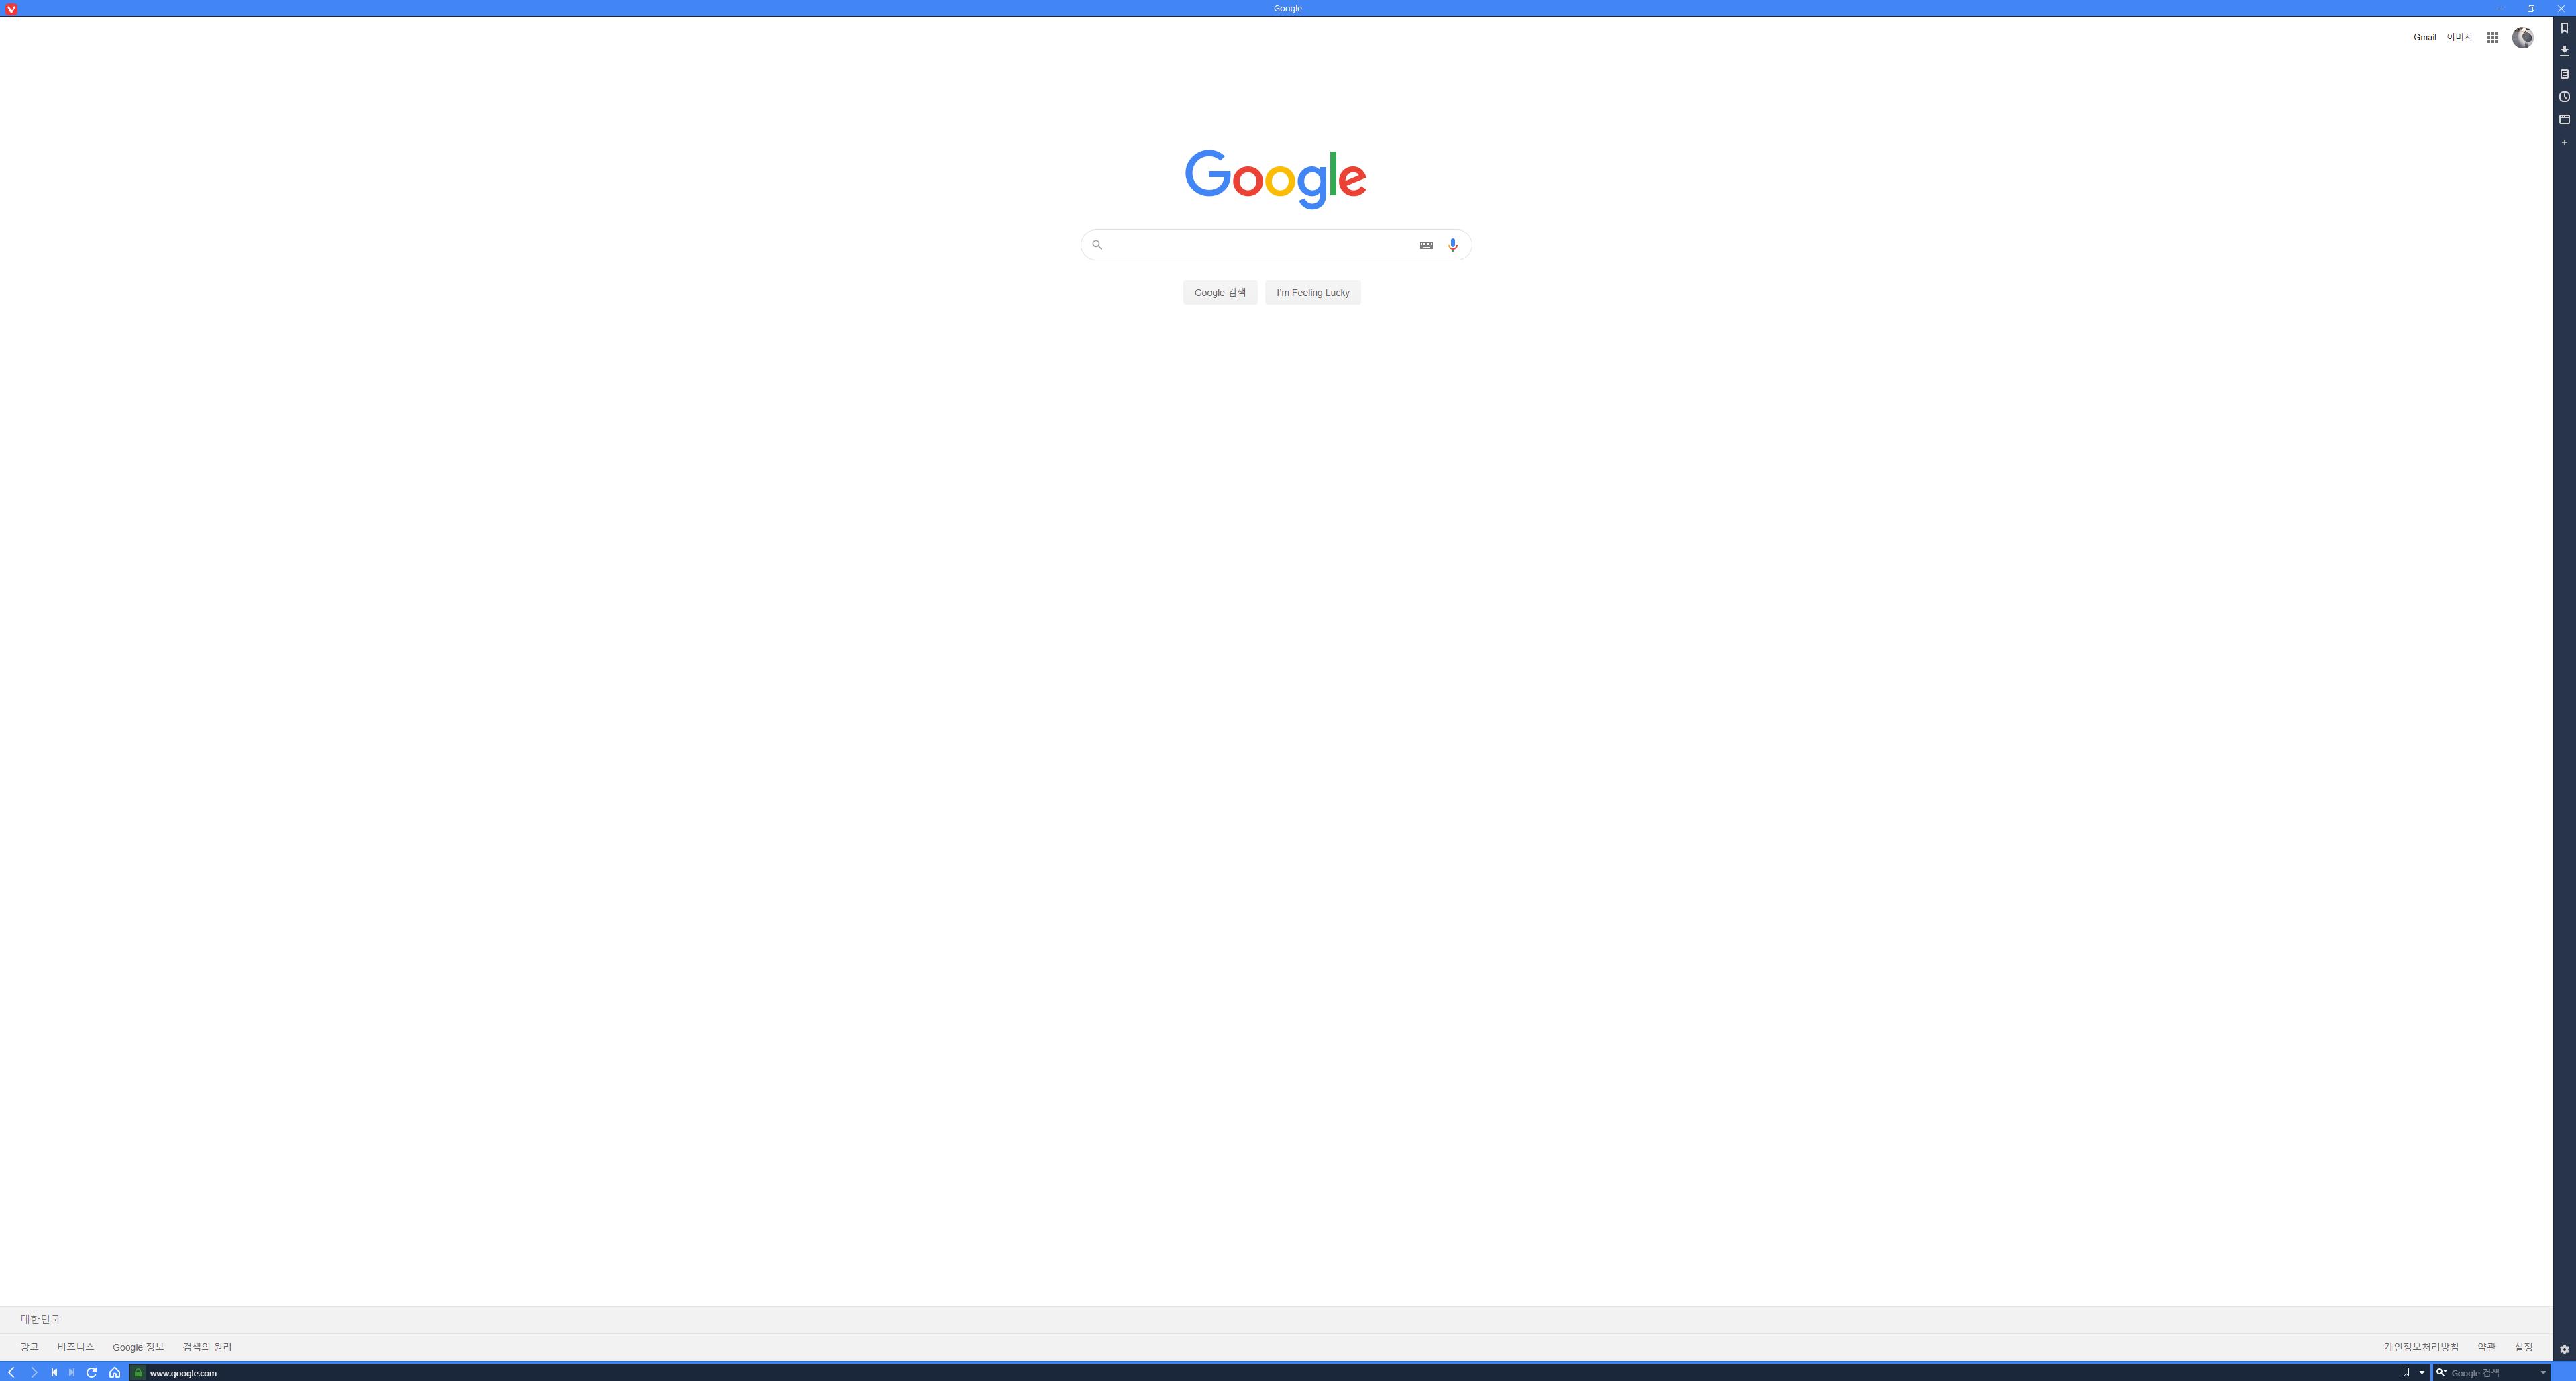 4k 구글이다 맨이야.png